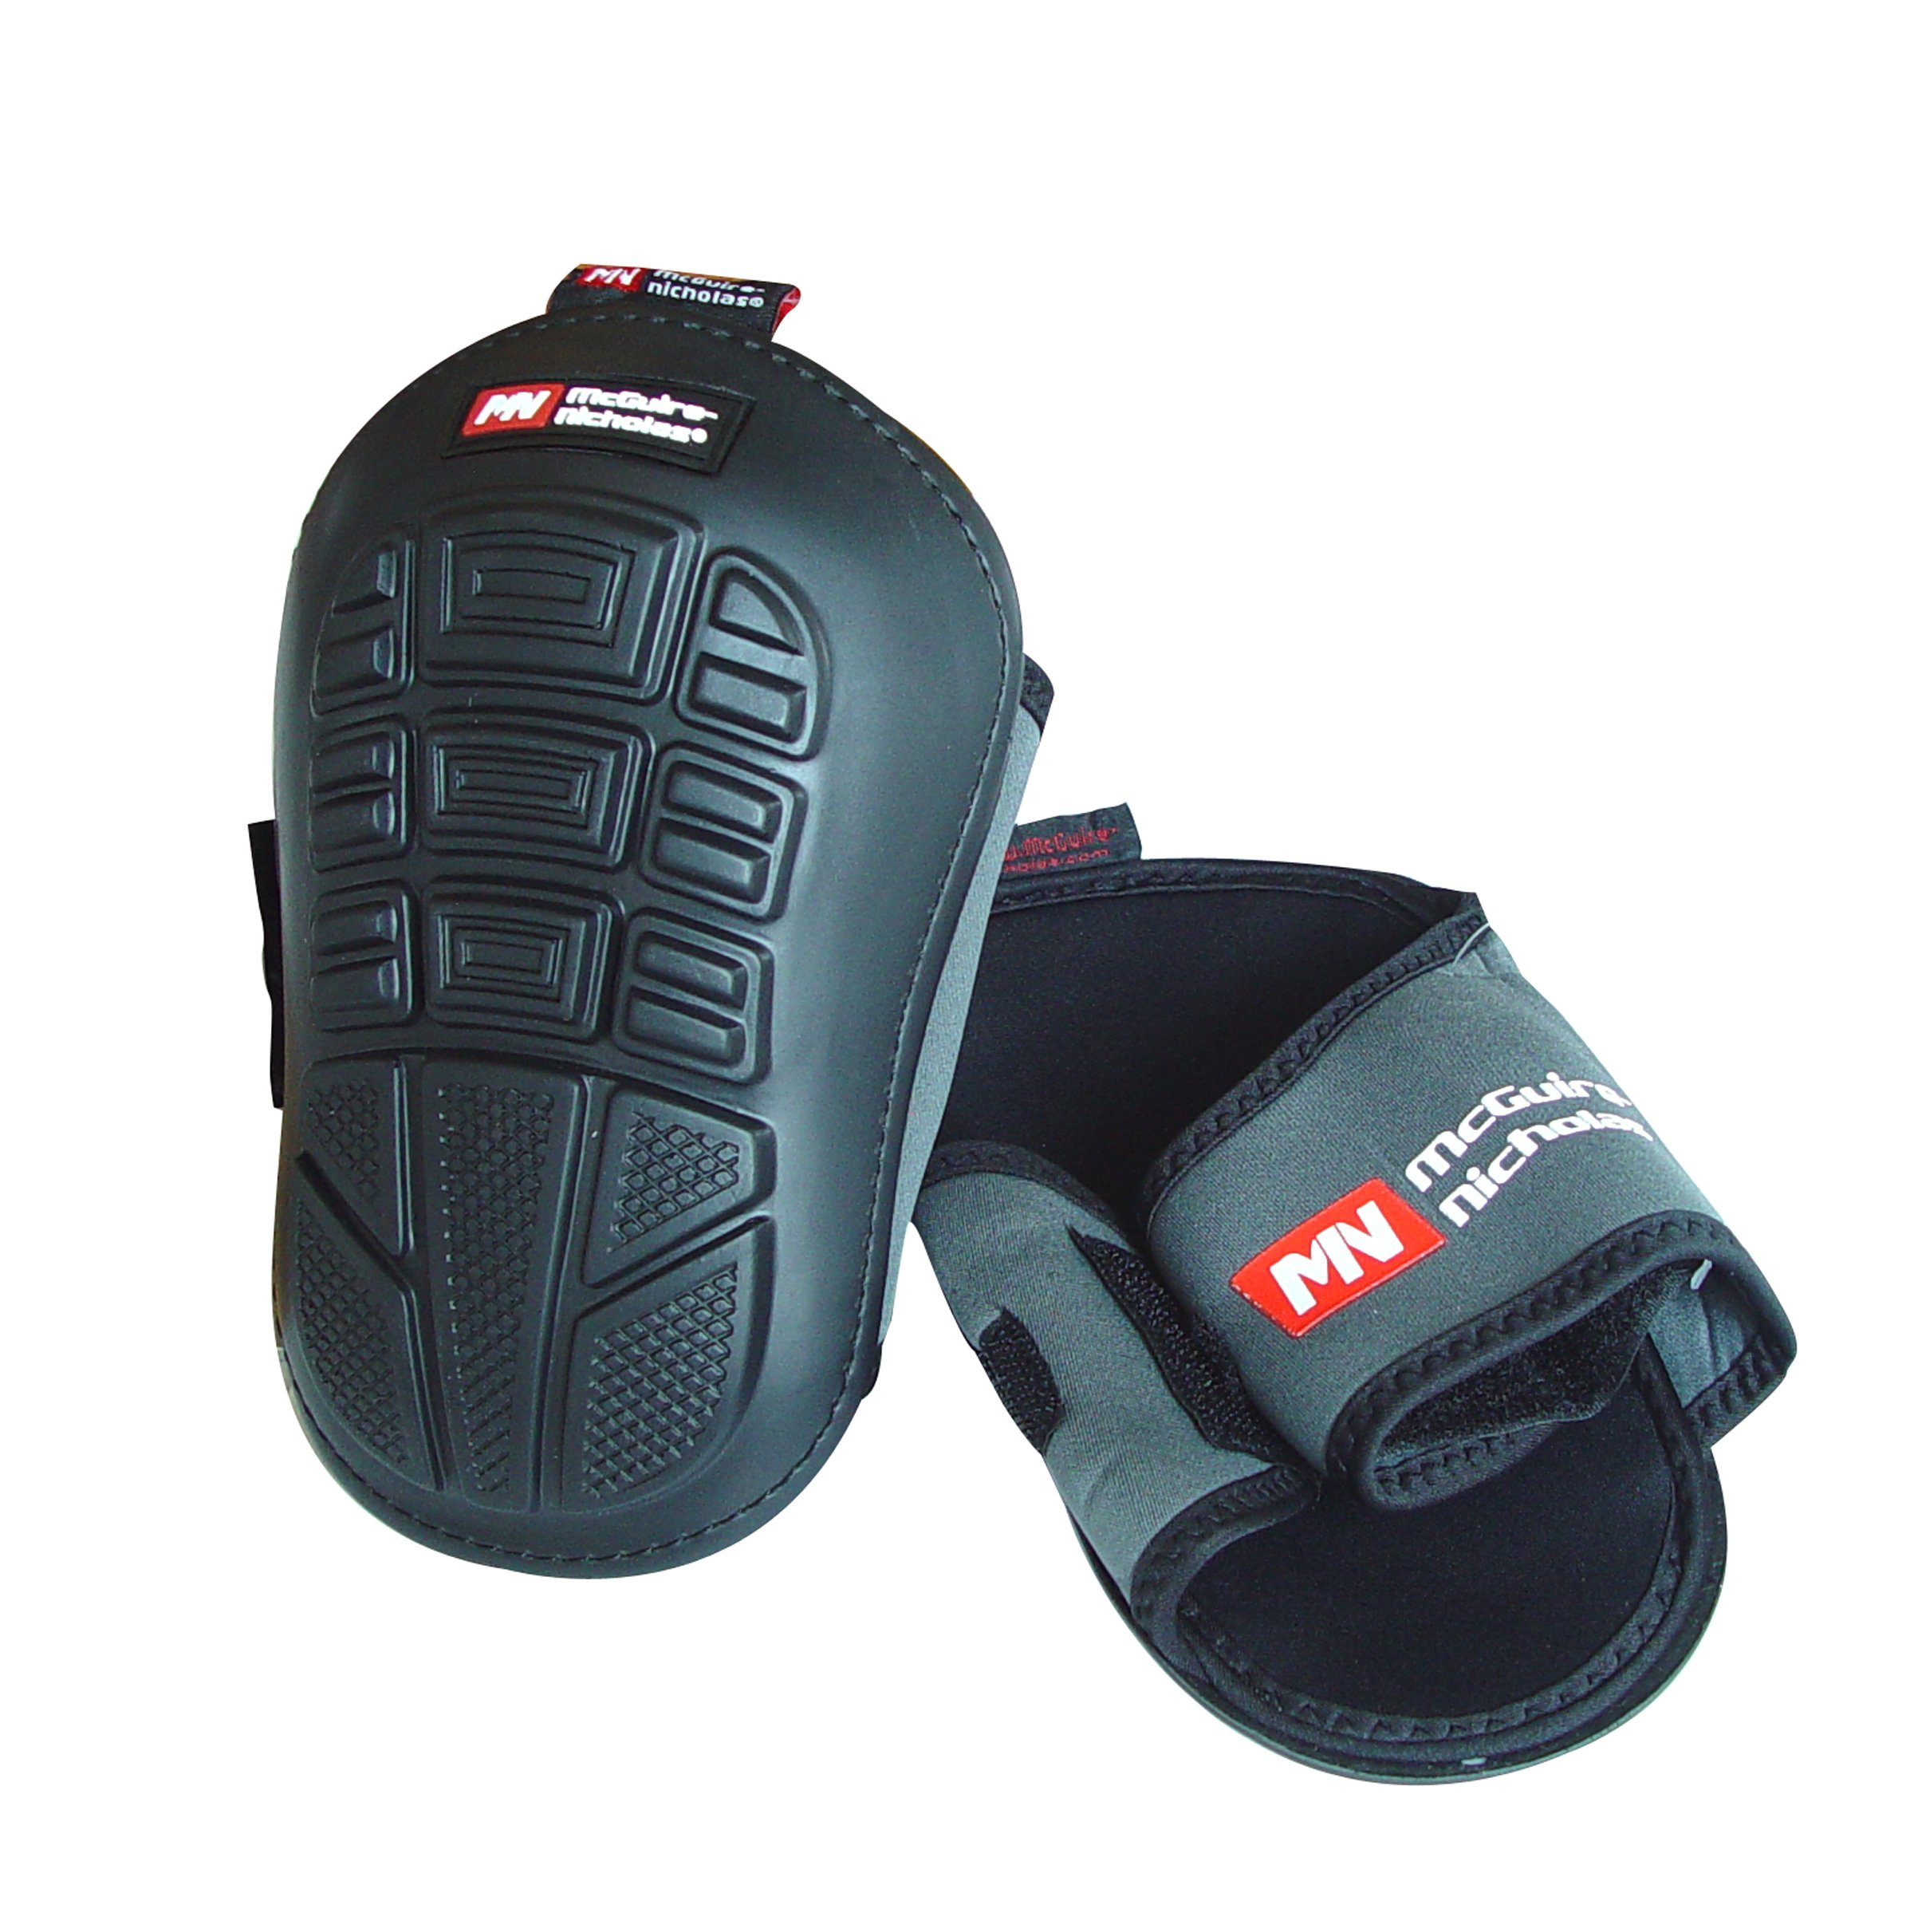 McGuire Nicholas 22373 Monster Knee Pads by McGuire-Nicholas